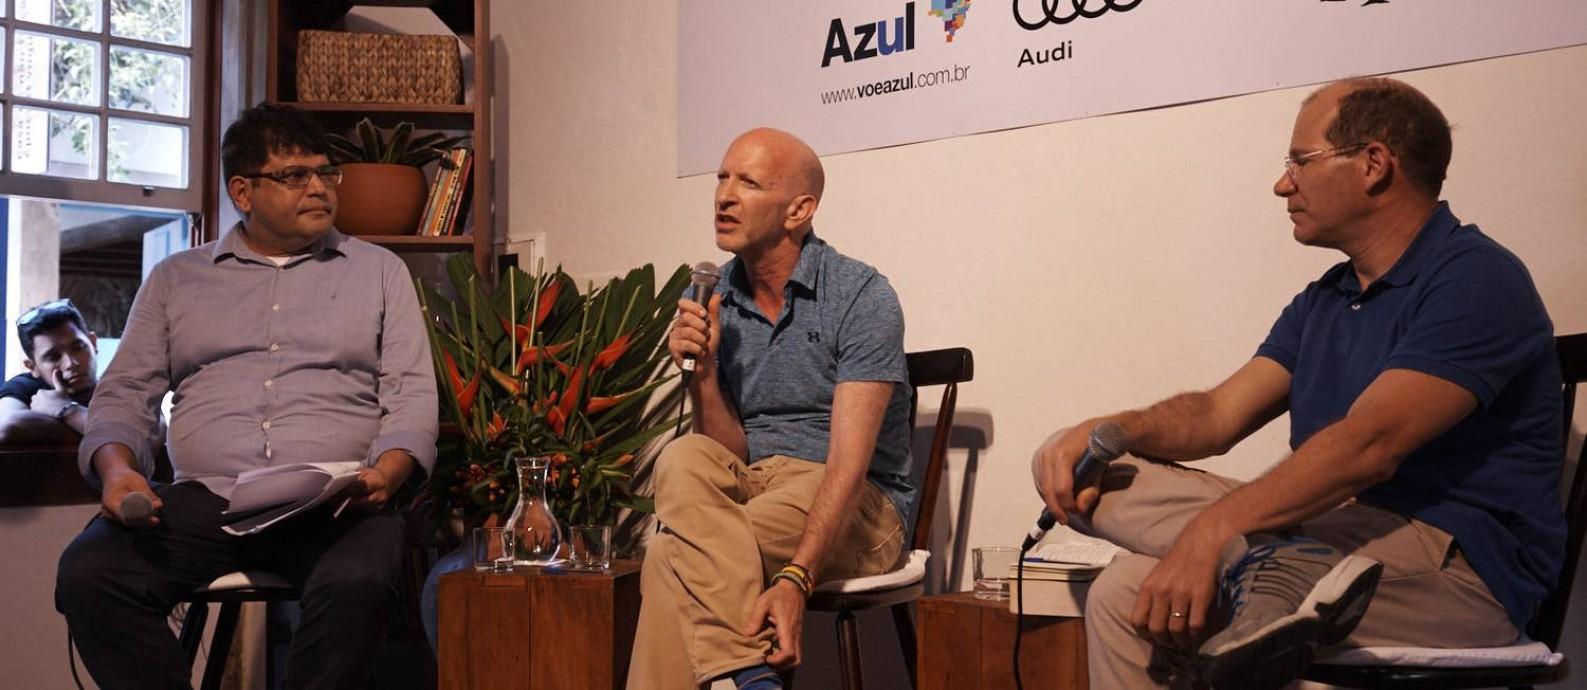 Plínio Fraga, editor-chefe de ÉPOCA, com os convidados Simon Montefiore e Helio Gurovitz Foto: Foto: Marcelo Saraiva Chaves